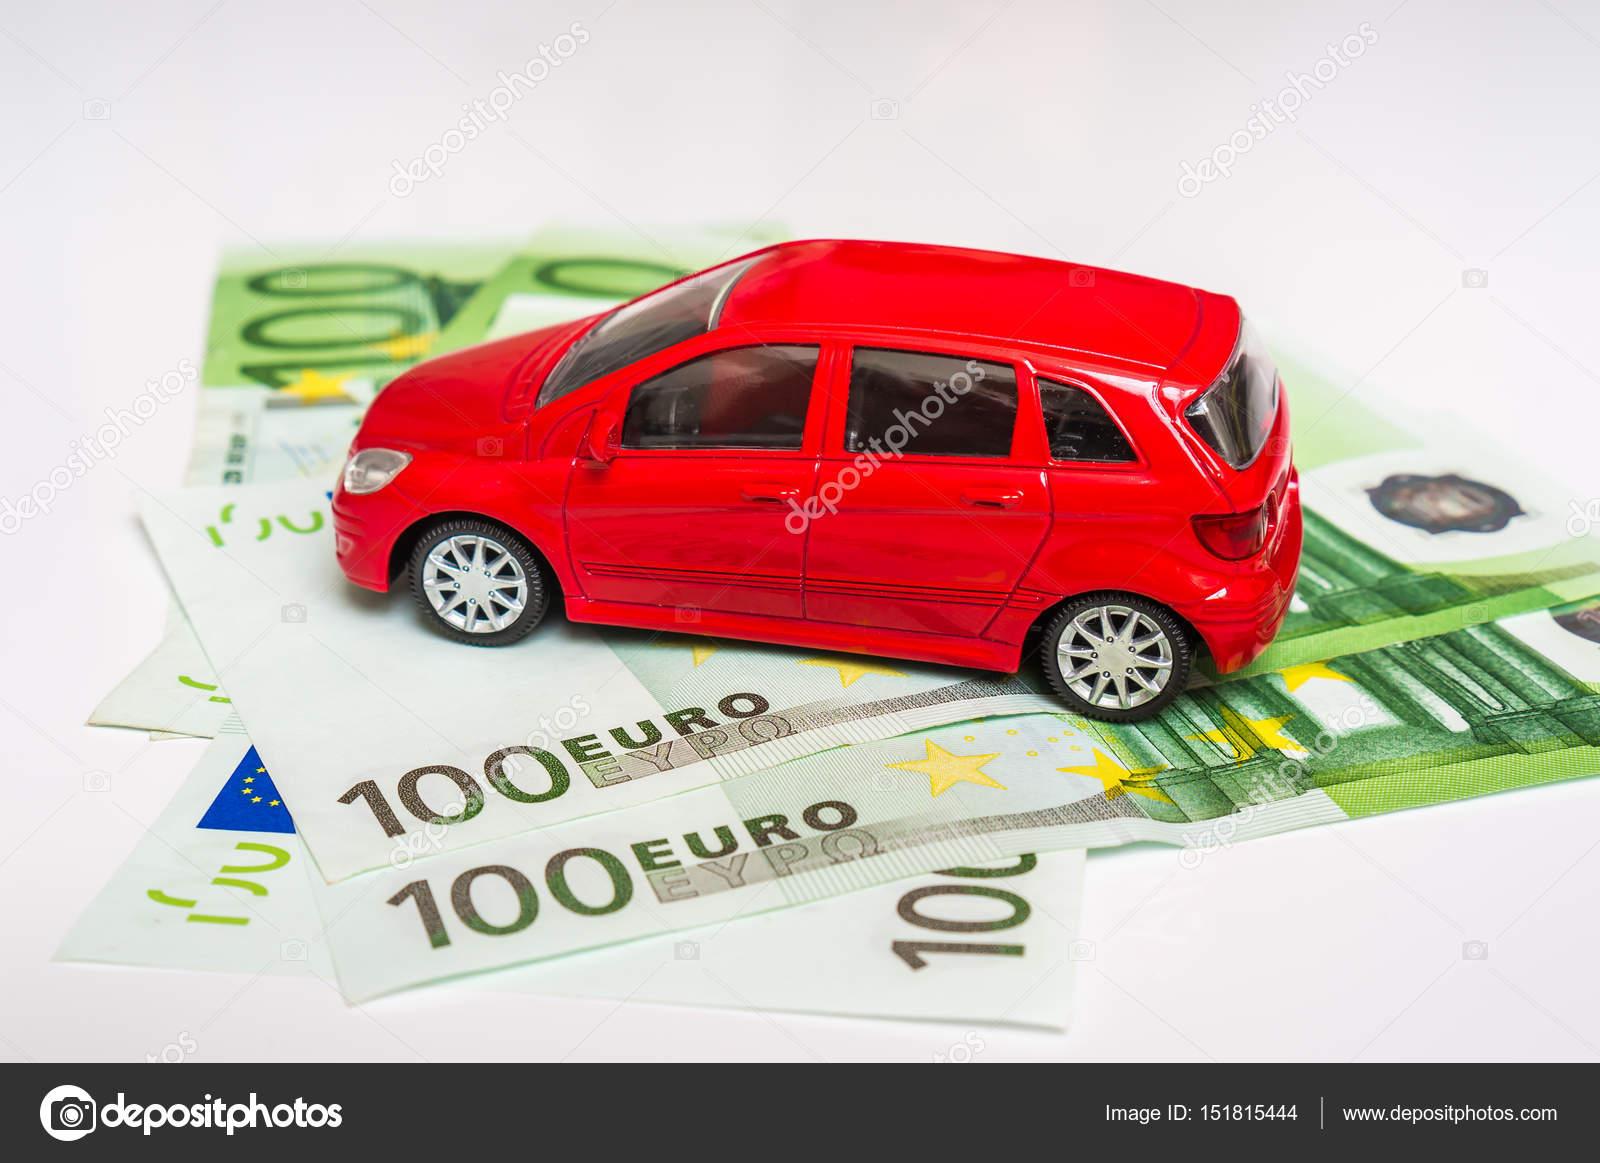 Dinero Juguete Comprar SeguroAlquilar Y Coche Euro c5AqR3j4L